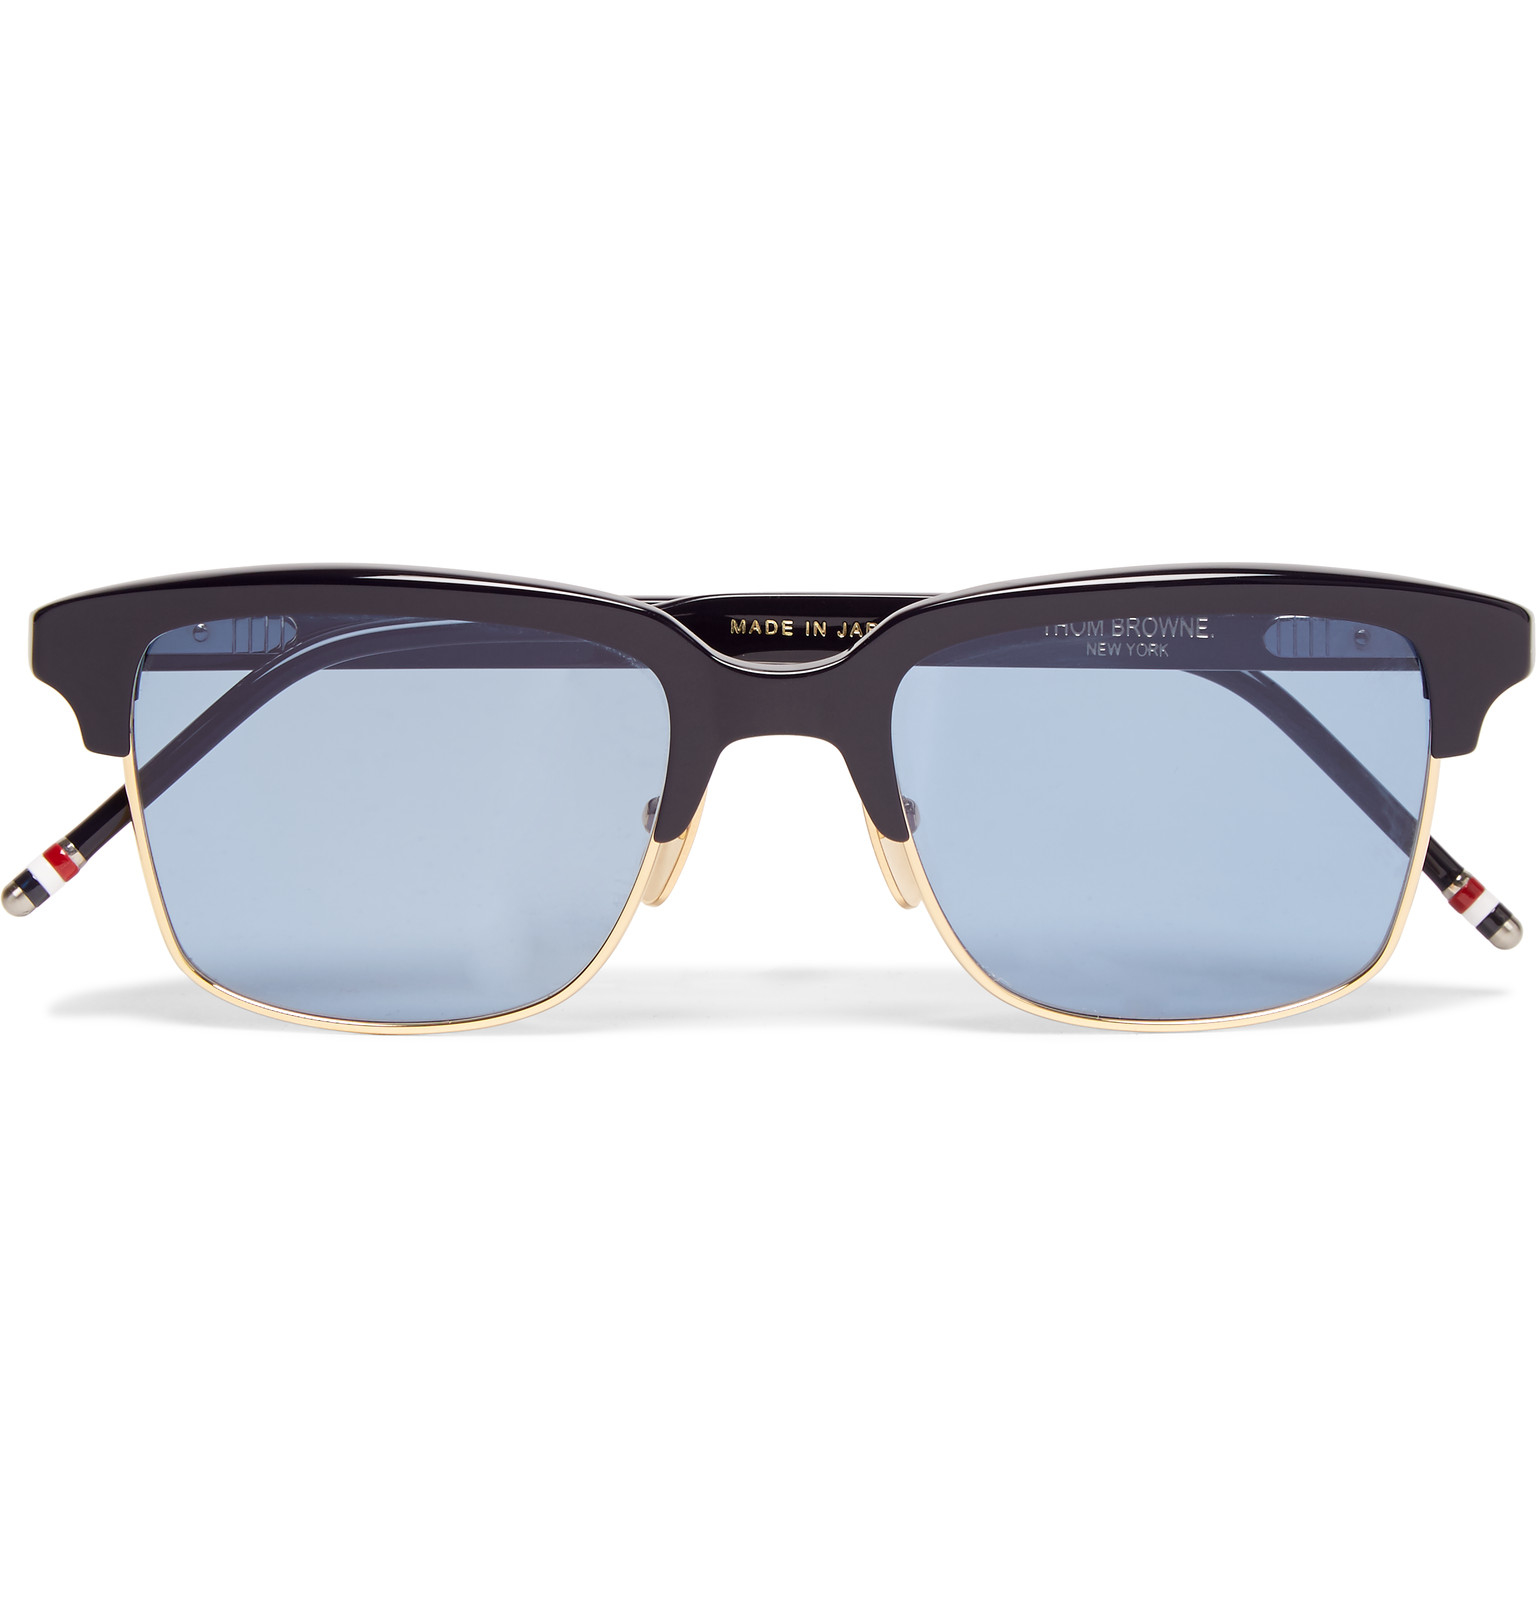 ac6cdba4147 Thom Browne Square-frame Acetate And Gold-tone Sunglasses in Blue ...